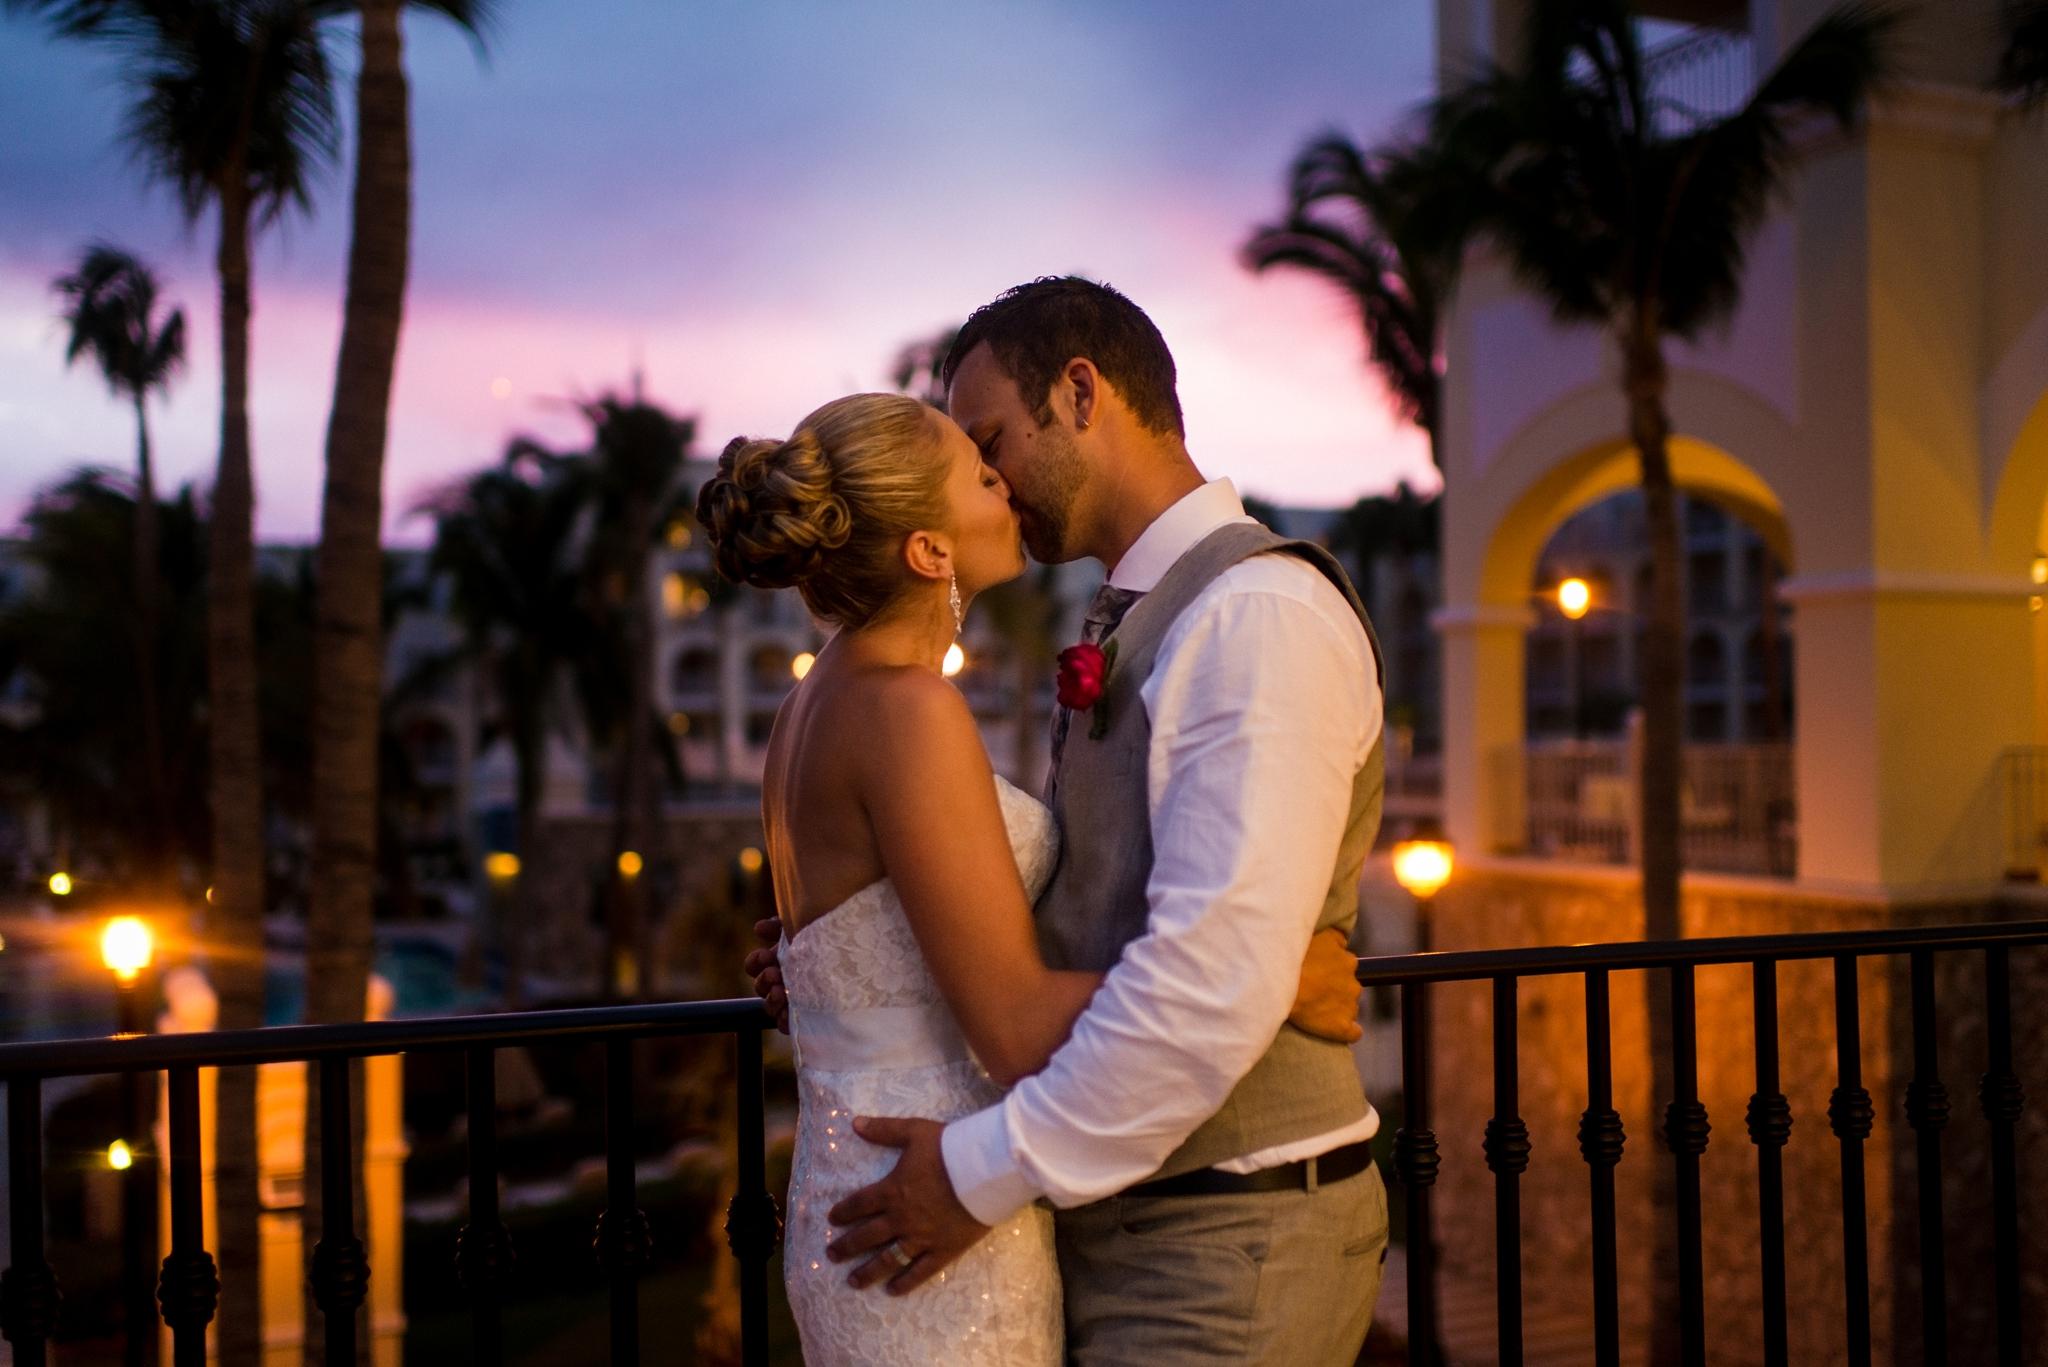 kaihla_tonai_intimate_wedding_elopement_photographer_1387